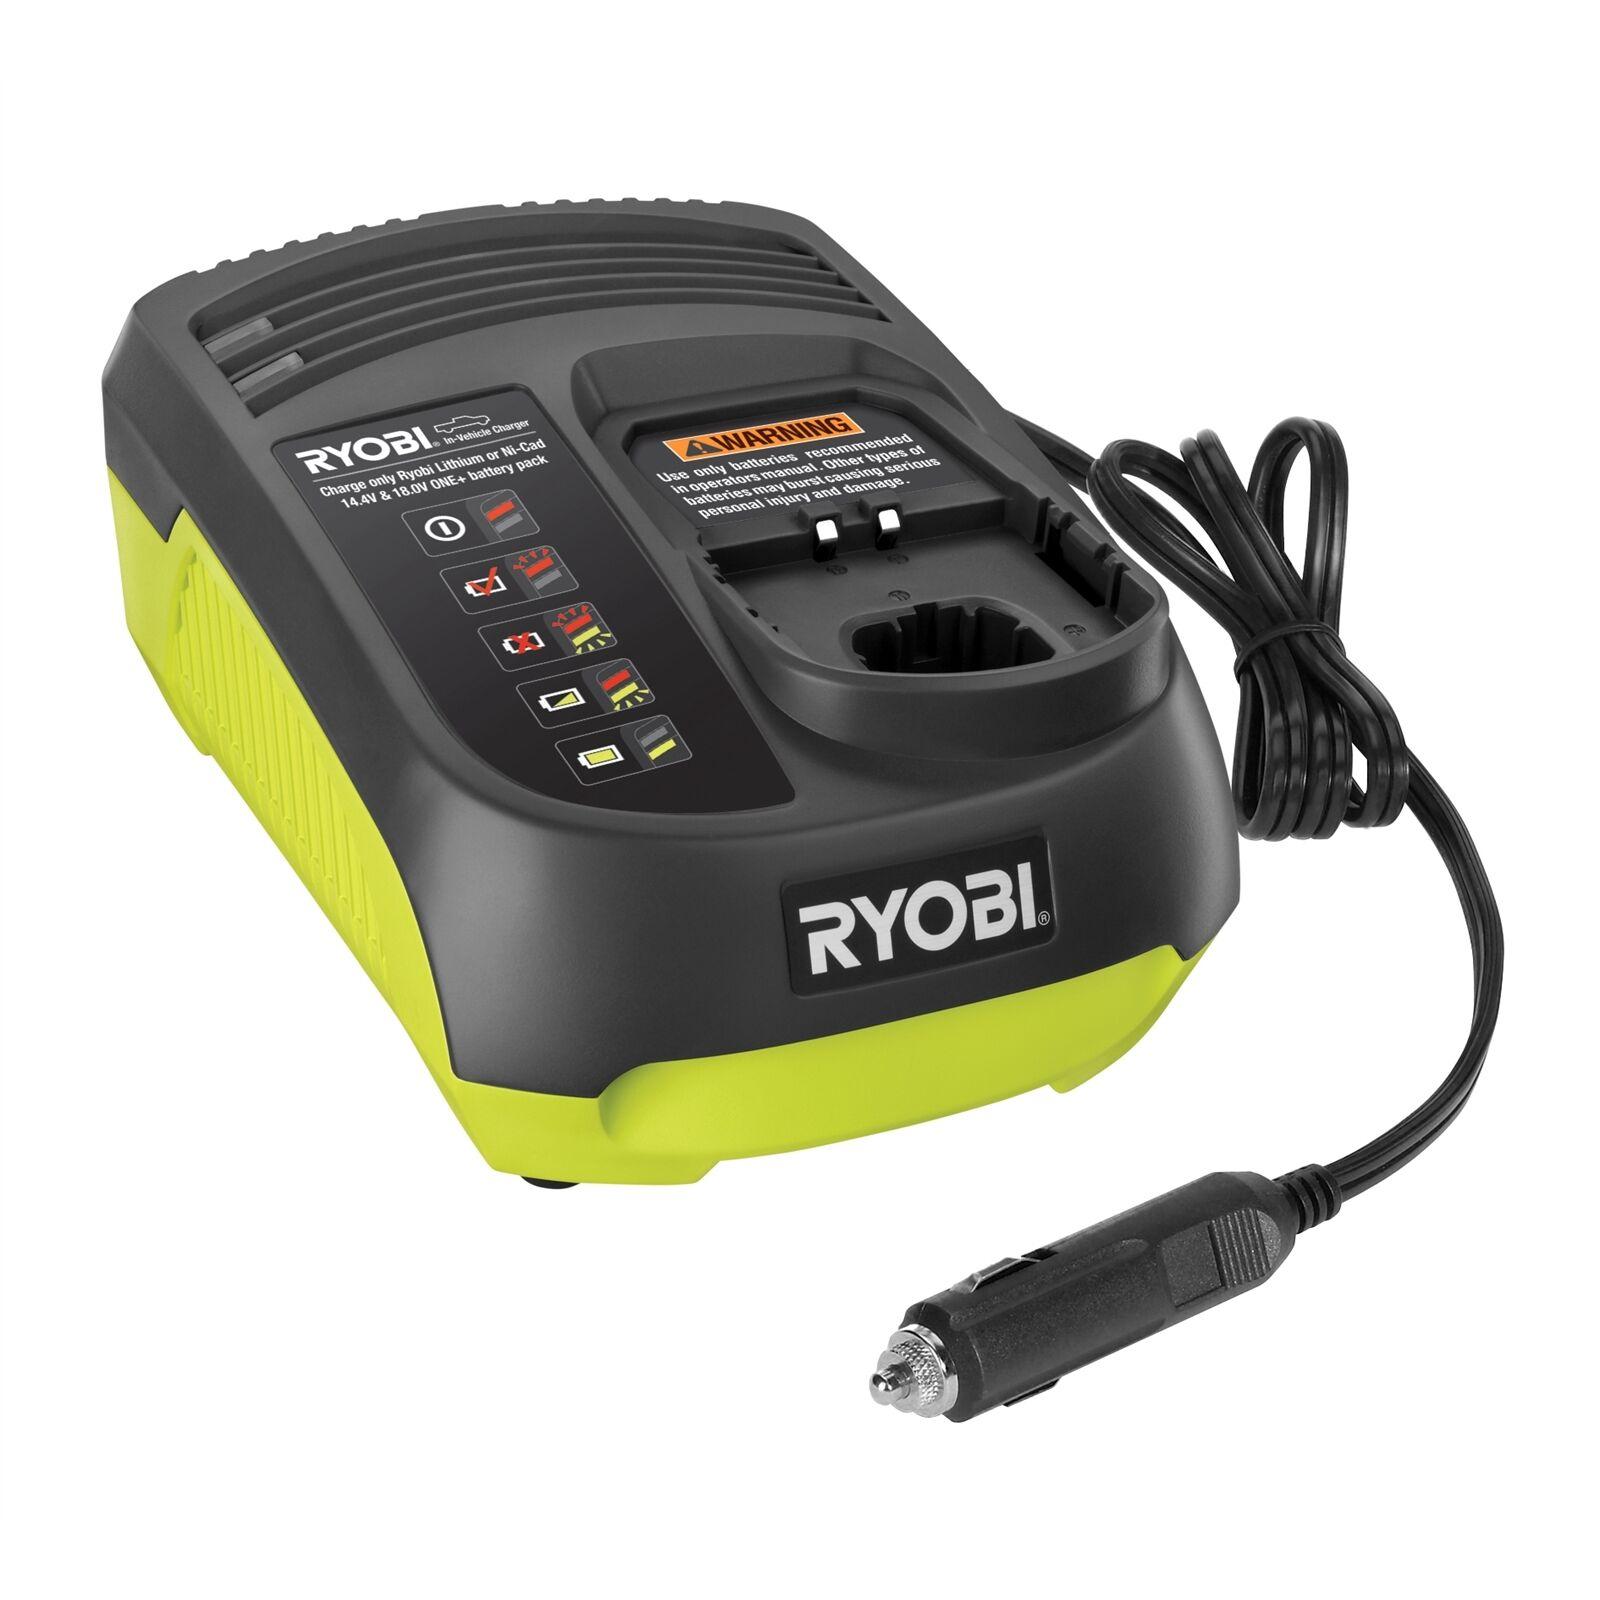 Ryobi ONE+ CAR BATTERY CHARGER 14.4 -18V Dual-Chem Niedrig Voltage Alarm LED Light